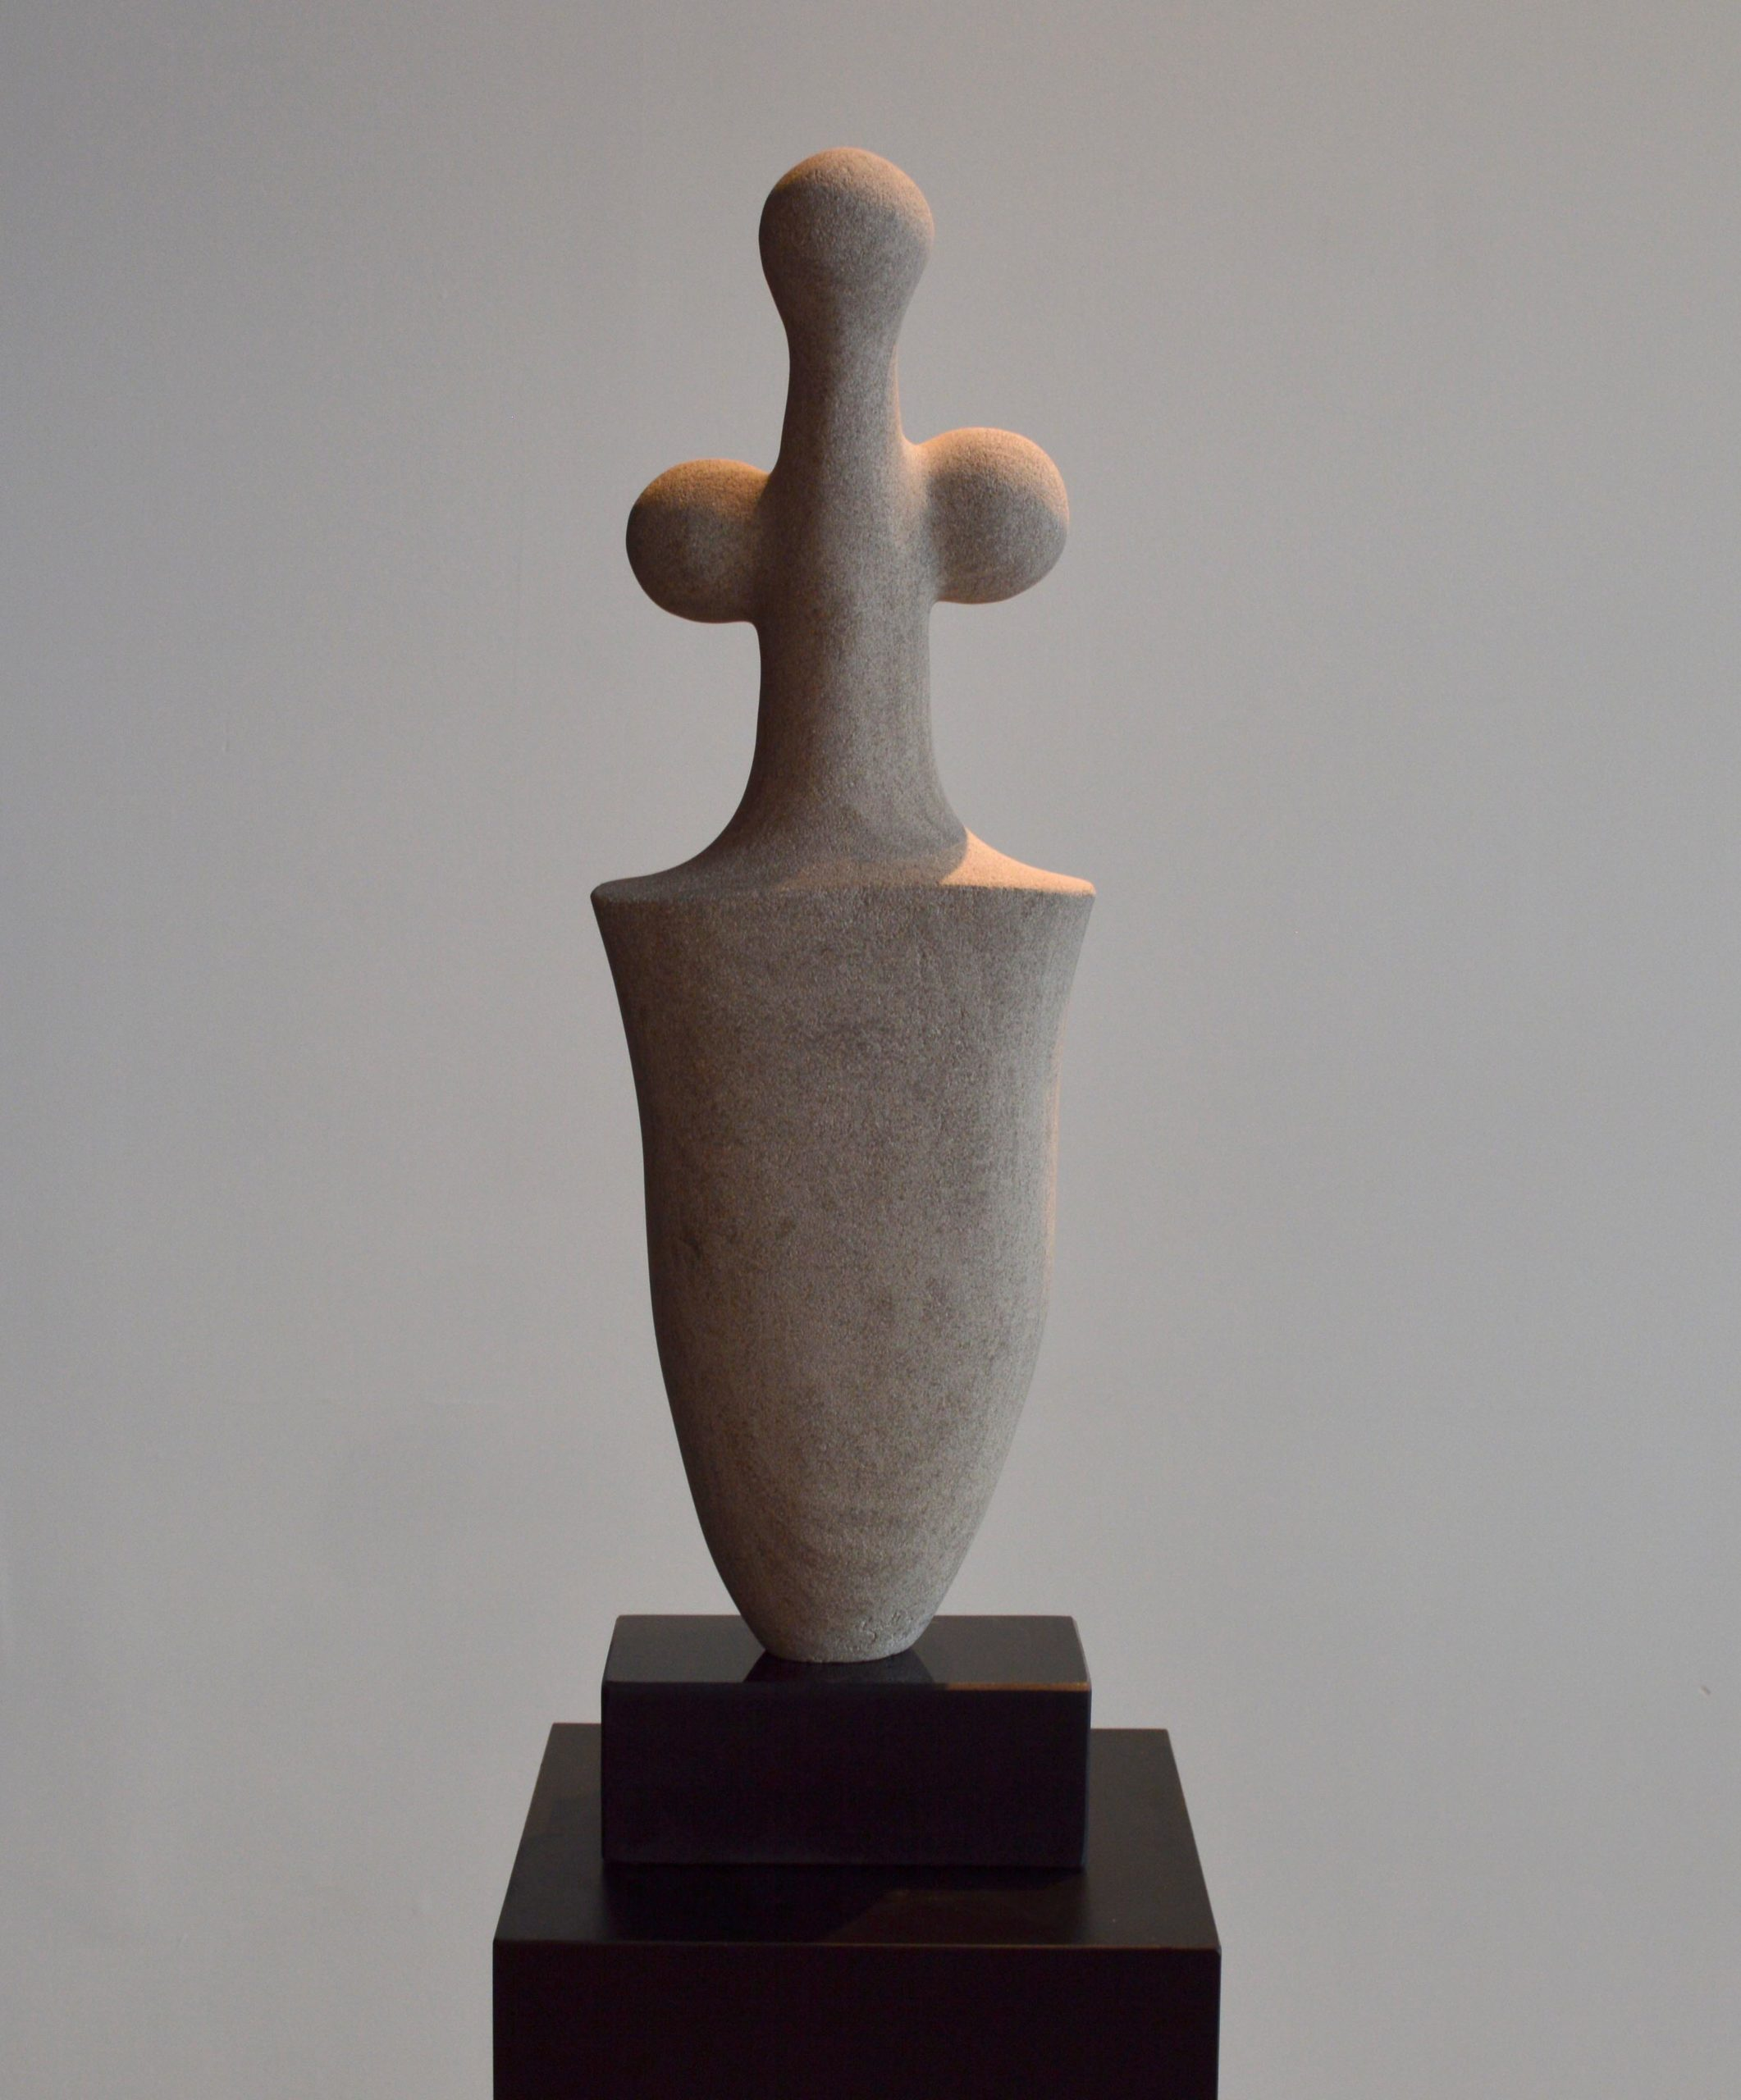 michael binkley sculptor stone sculpture abstract female nude garden statue limestone vancouver canada